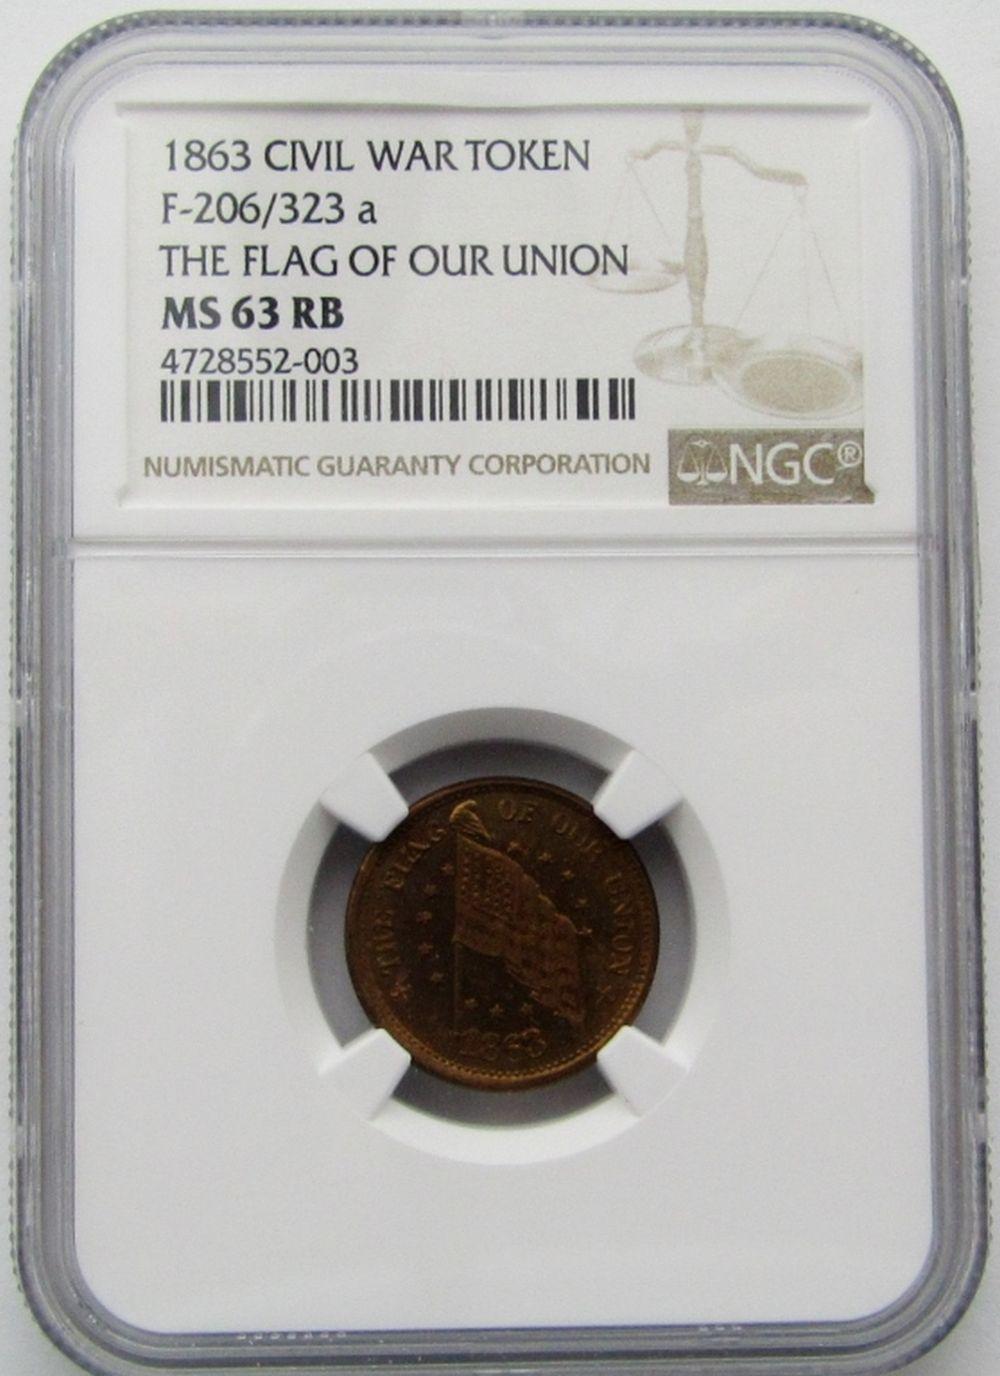 1863 CIVIL WAR TOKEN NGC MS 63 RB